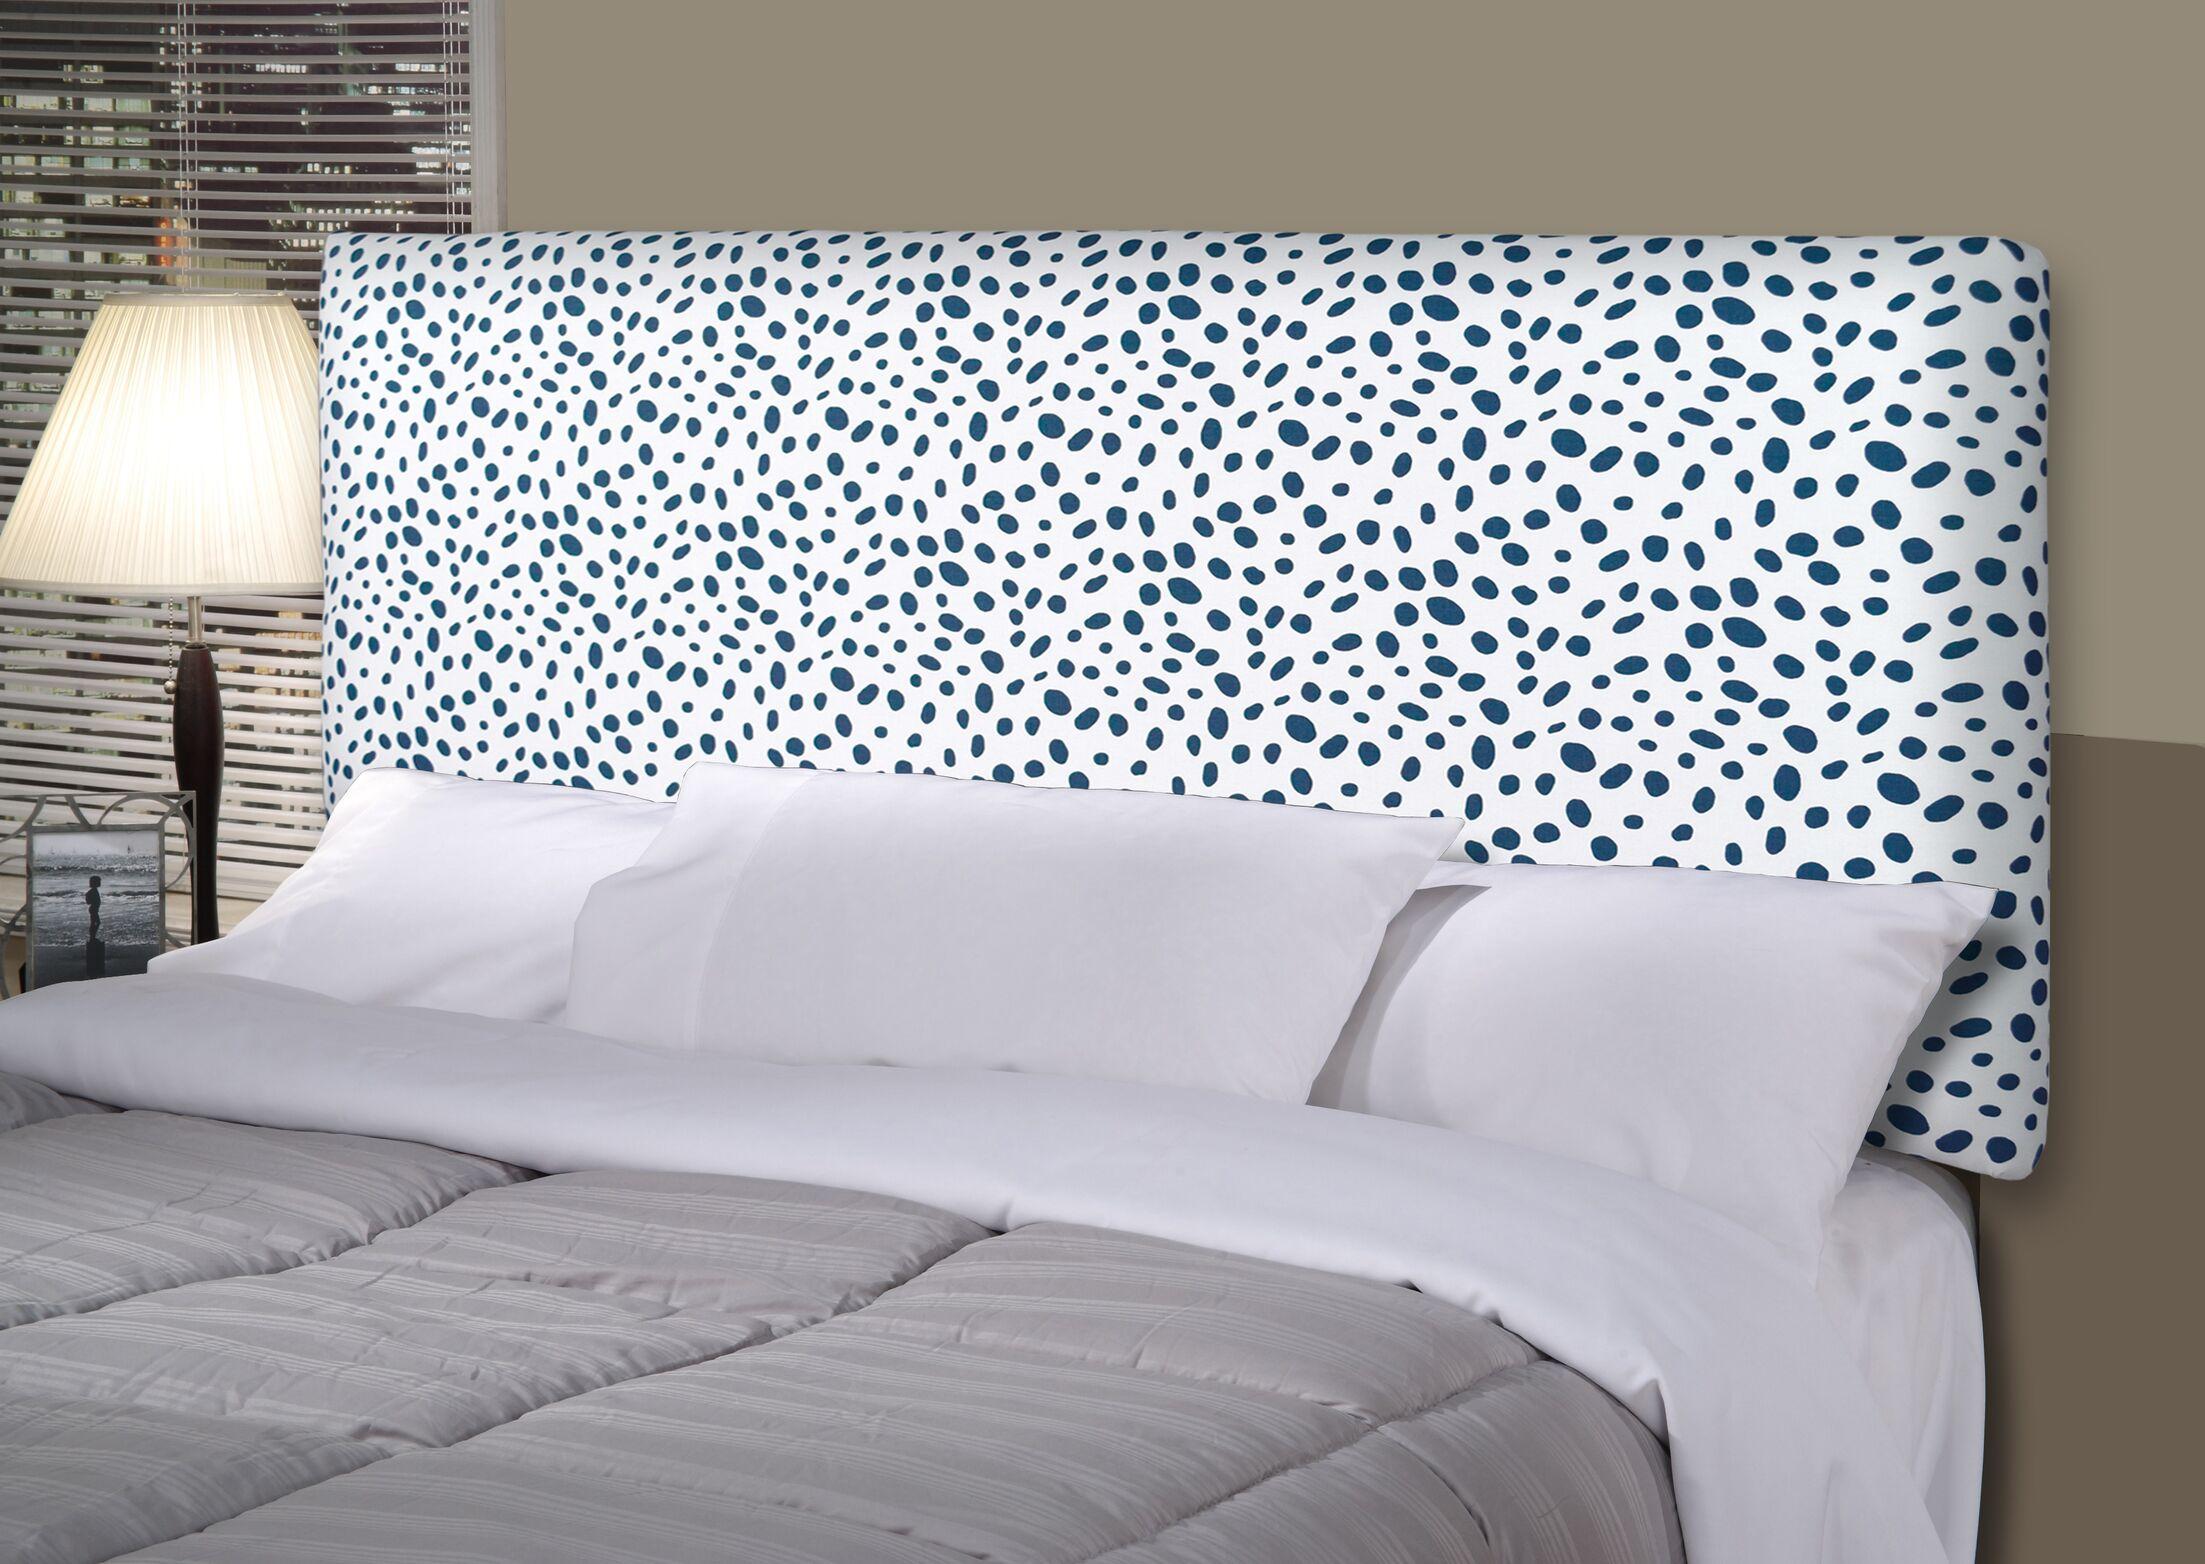 Togo Alice Upholstered Panel Headboard Upholstery: Aqua Blue, Size: King